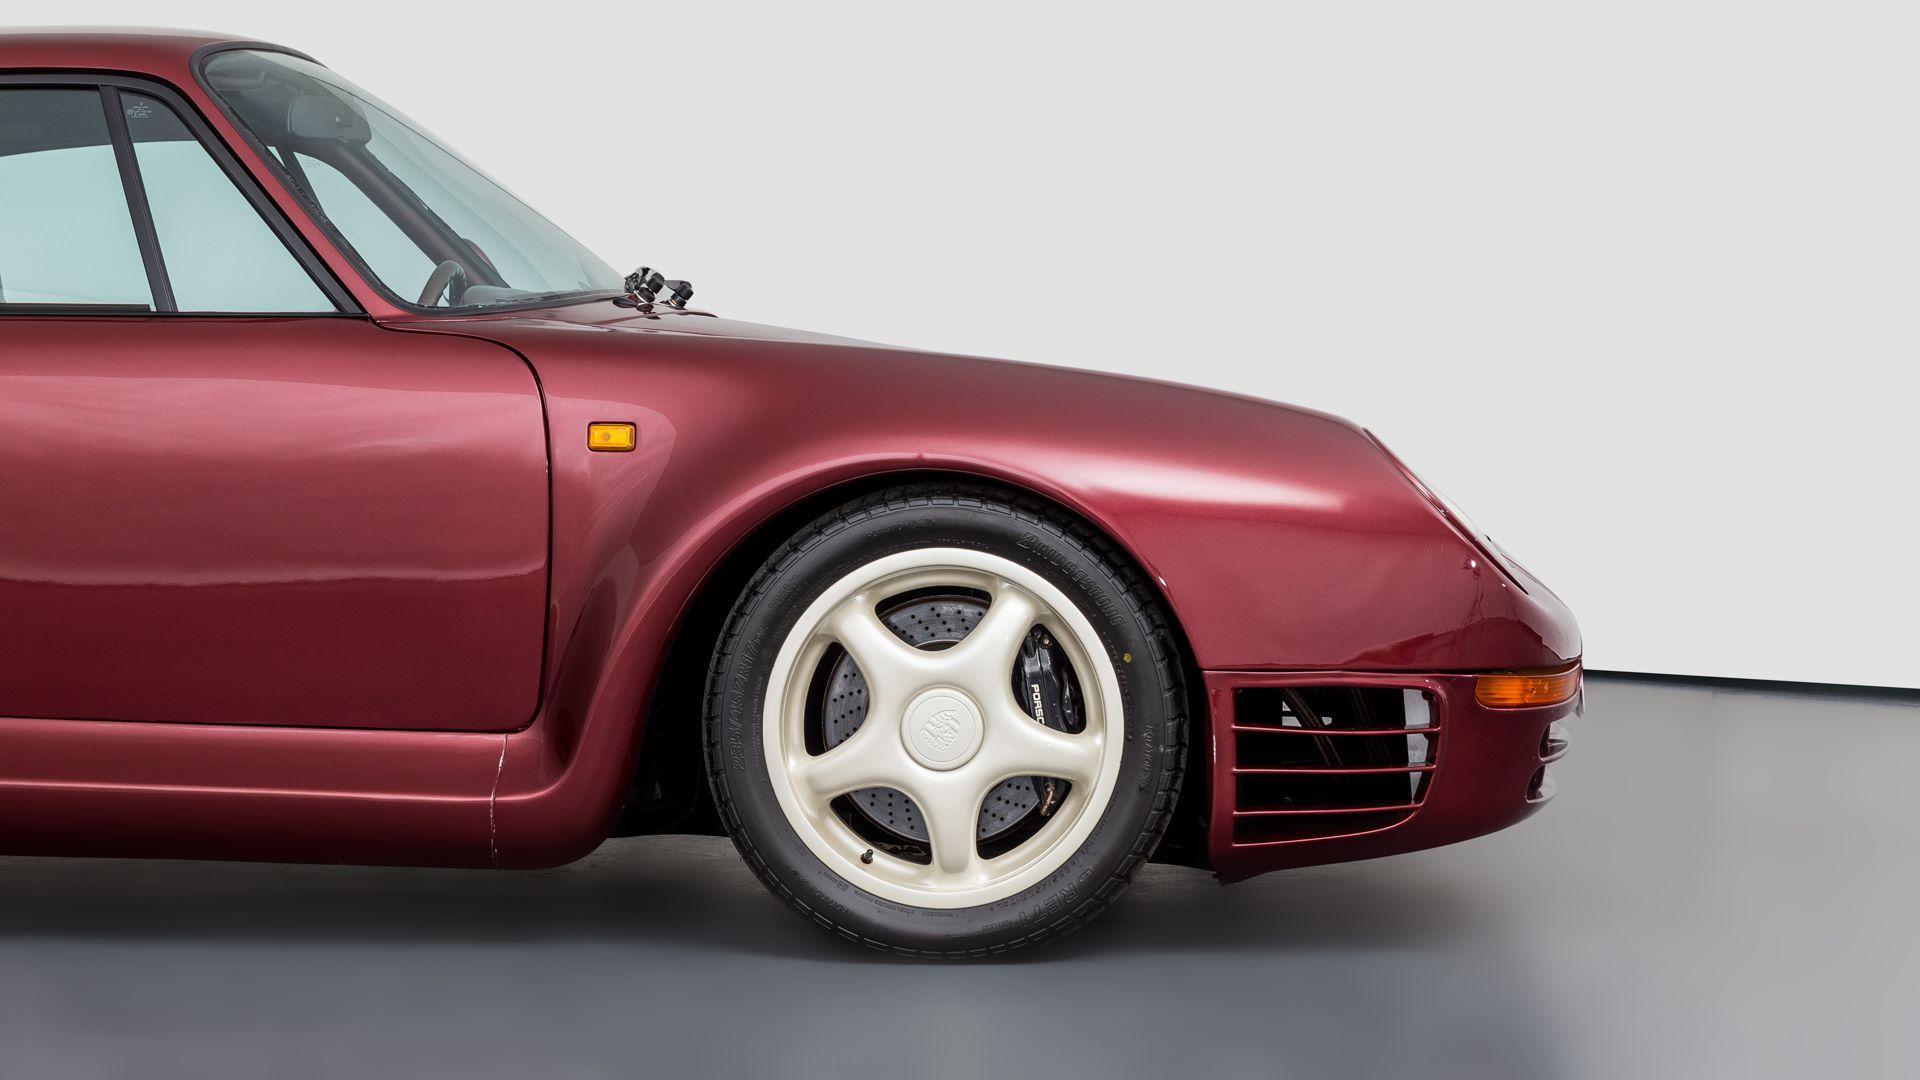 Porsche-959-Prototype-1985-for-sale-4